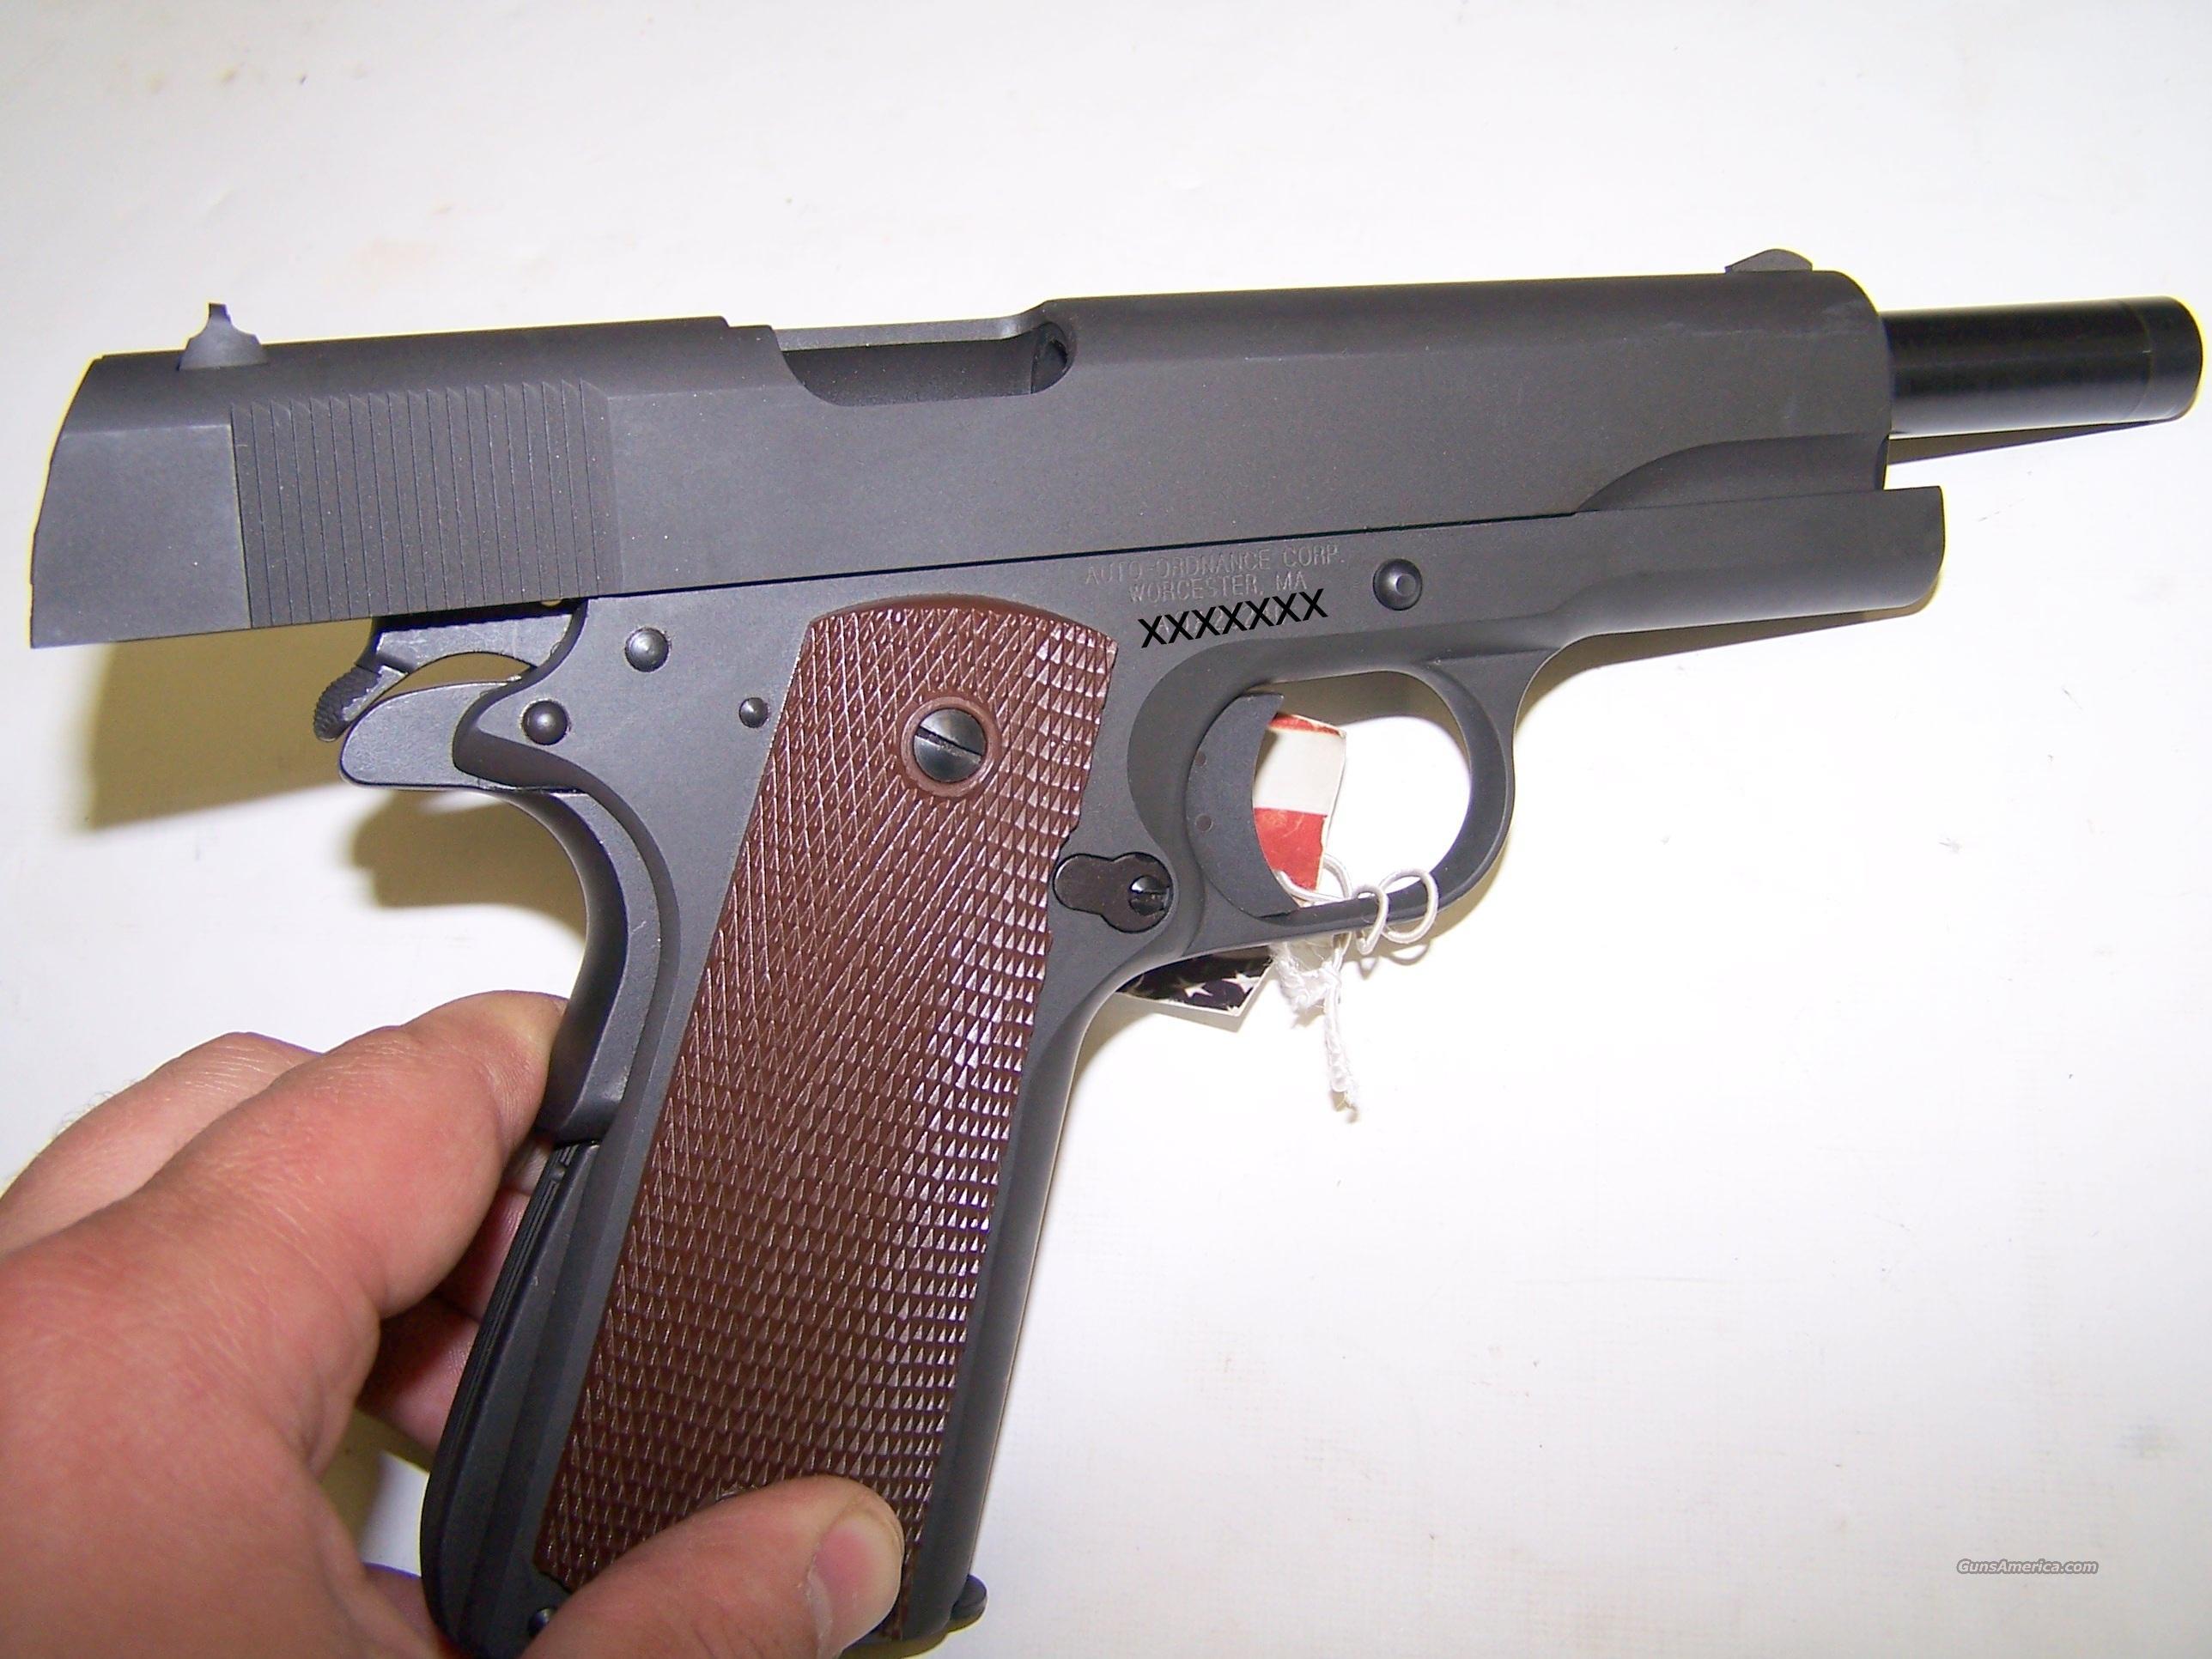 A1 Auto Sales >> Auto Ordnance 1911 A1 U.S. Army pistol .45 ACP ... for sale